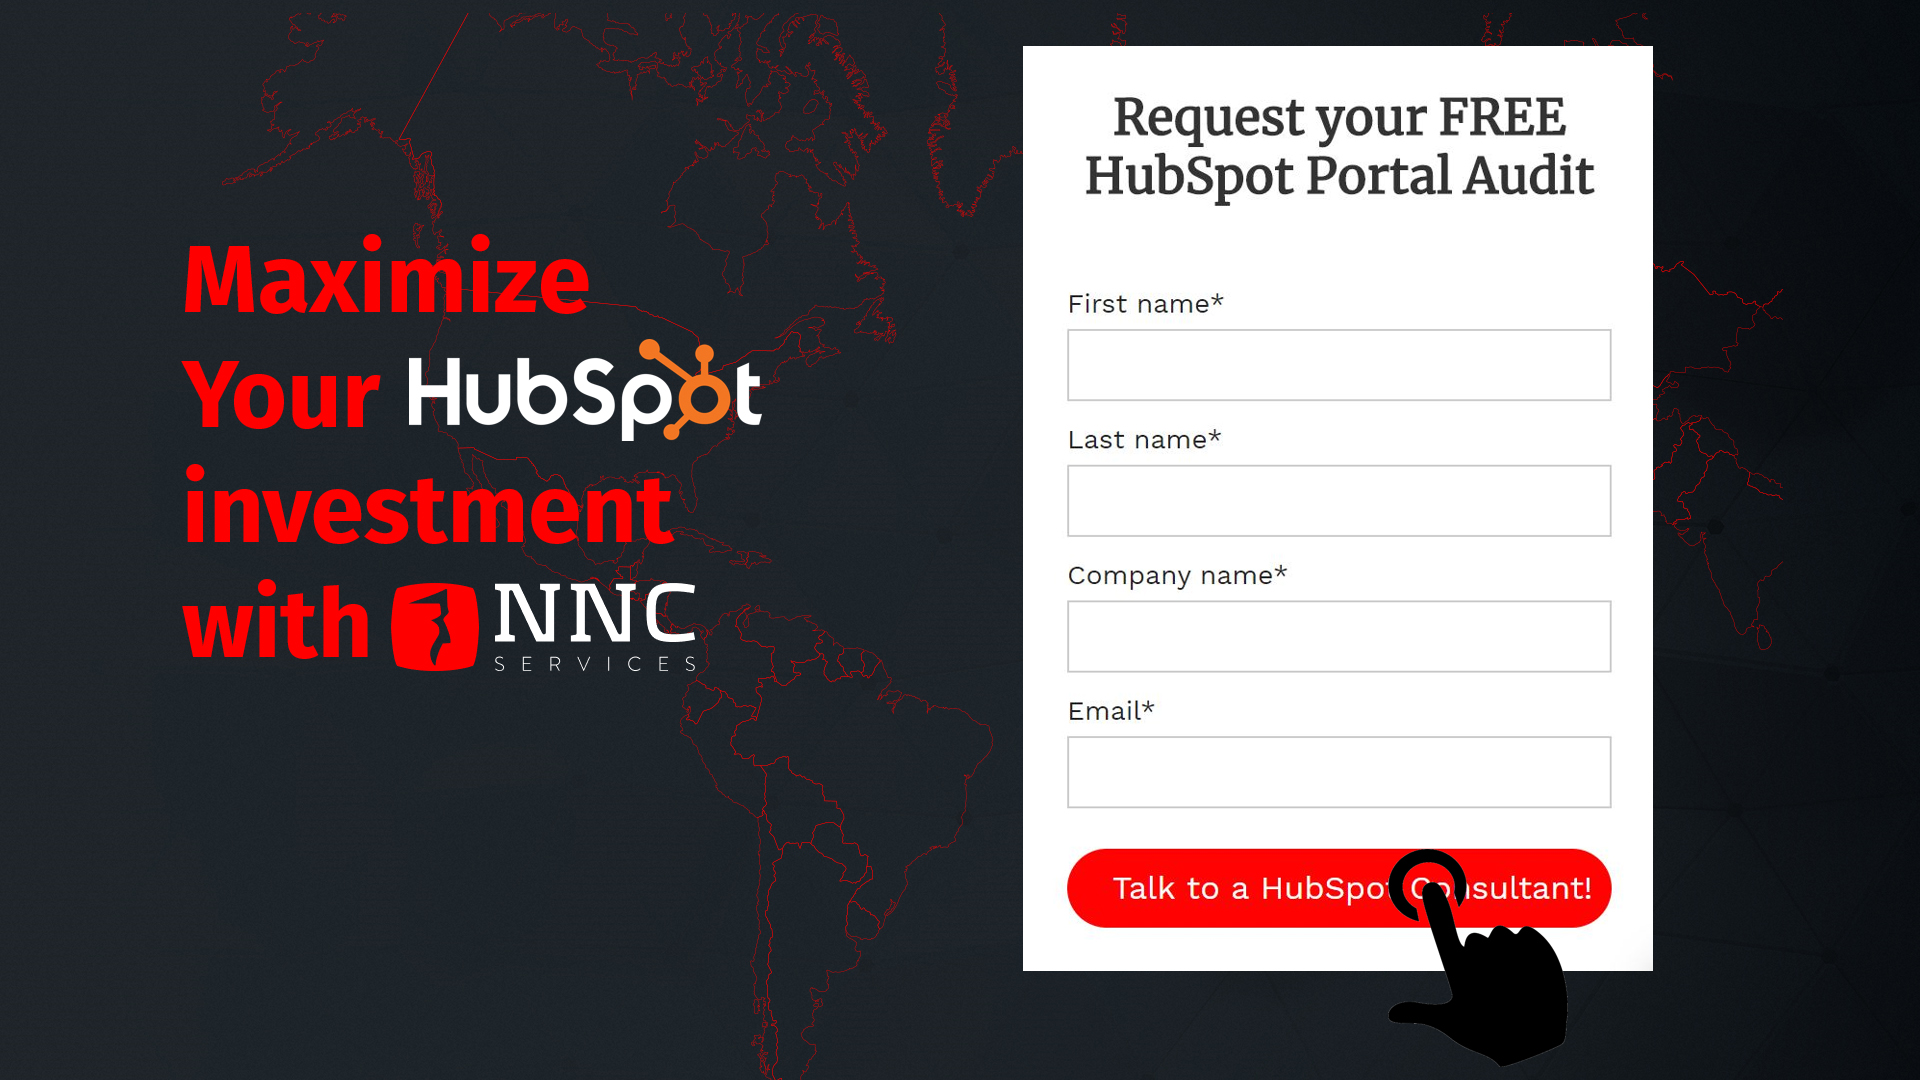 HubSpot-Portal-Audit